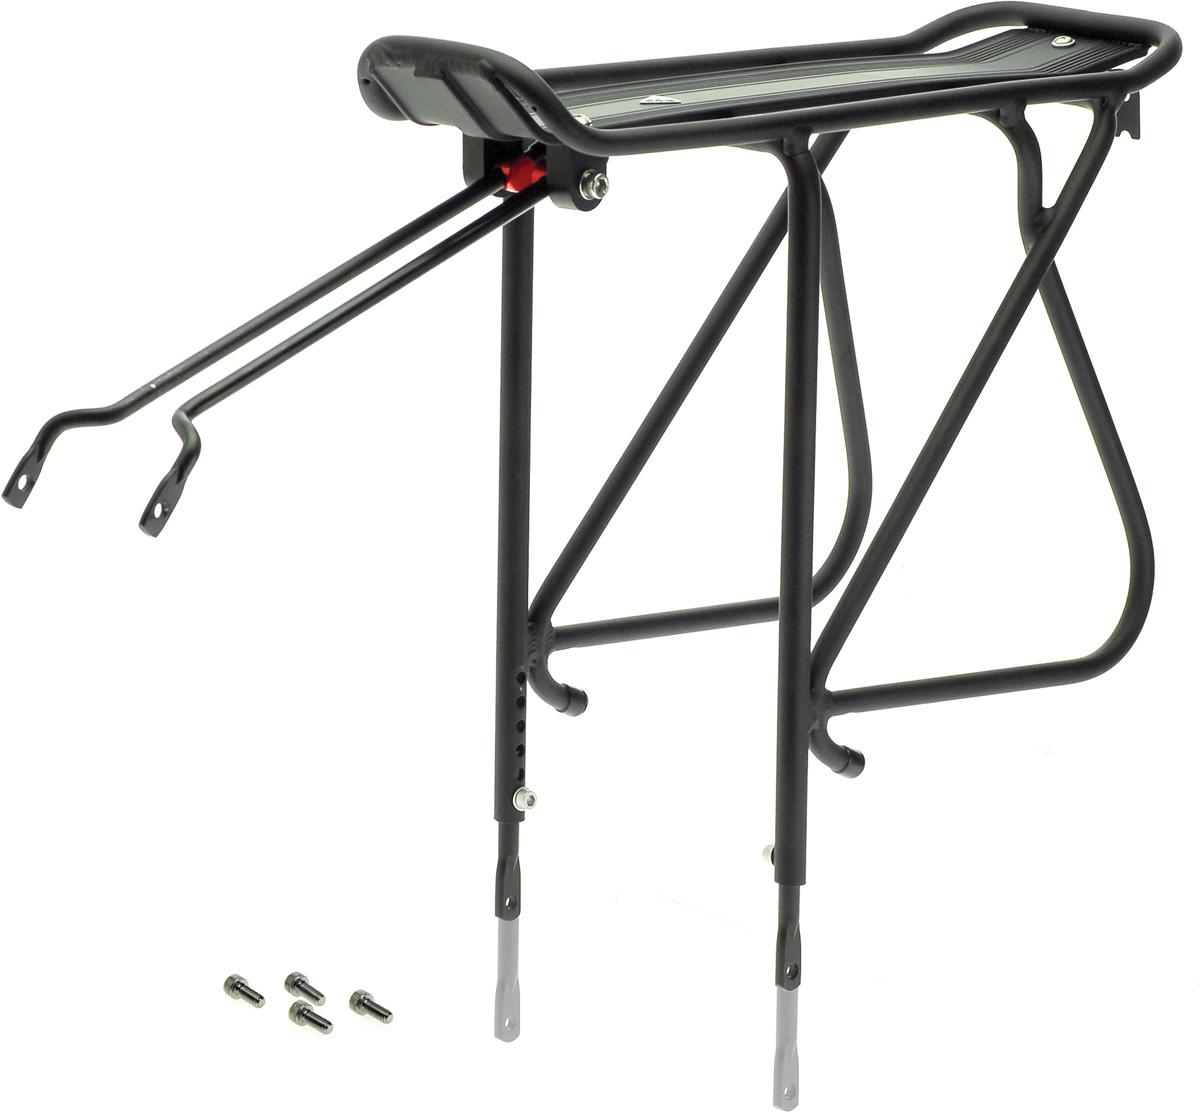 Axiom Journey Adjustable Rear Rack Black